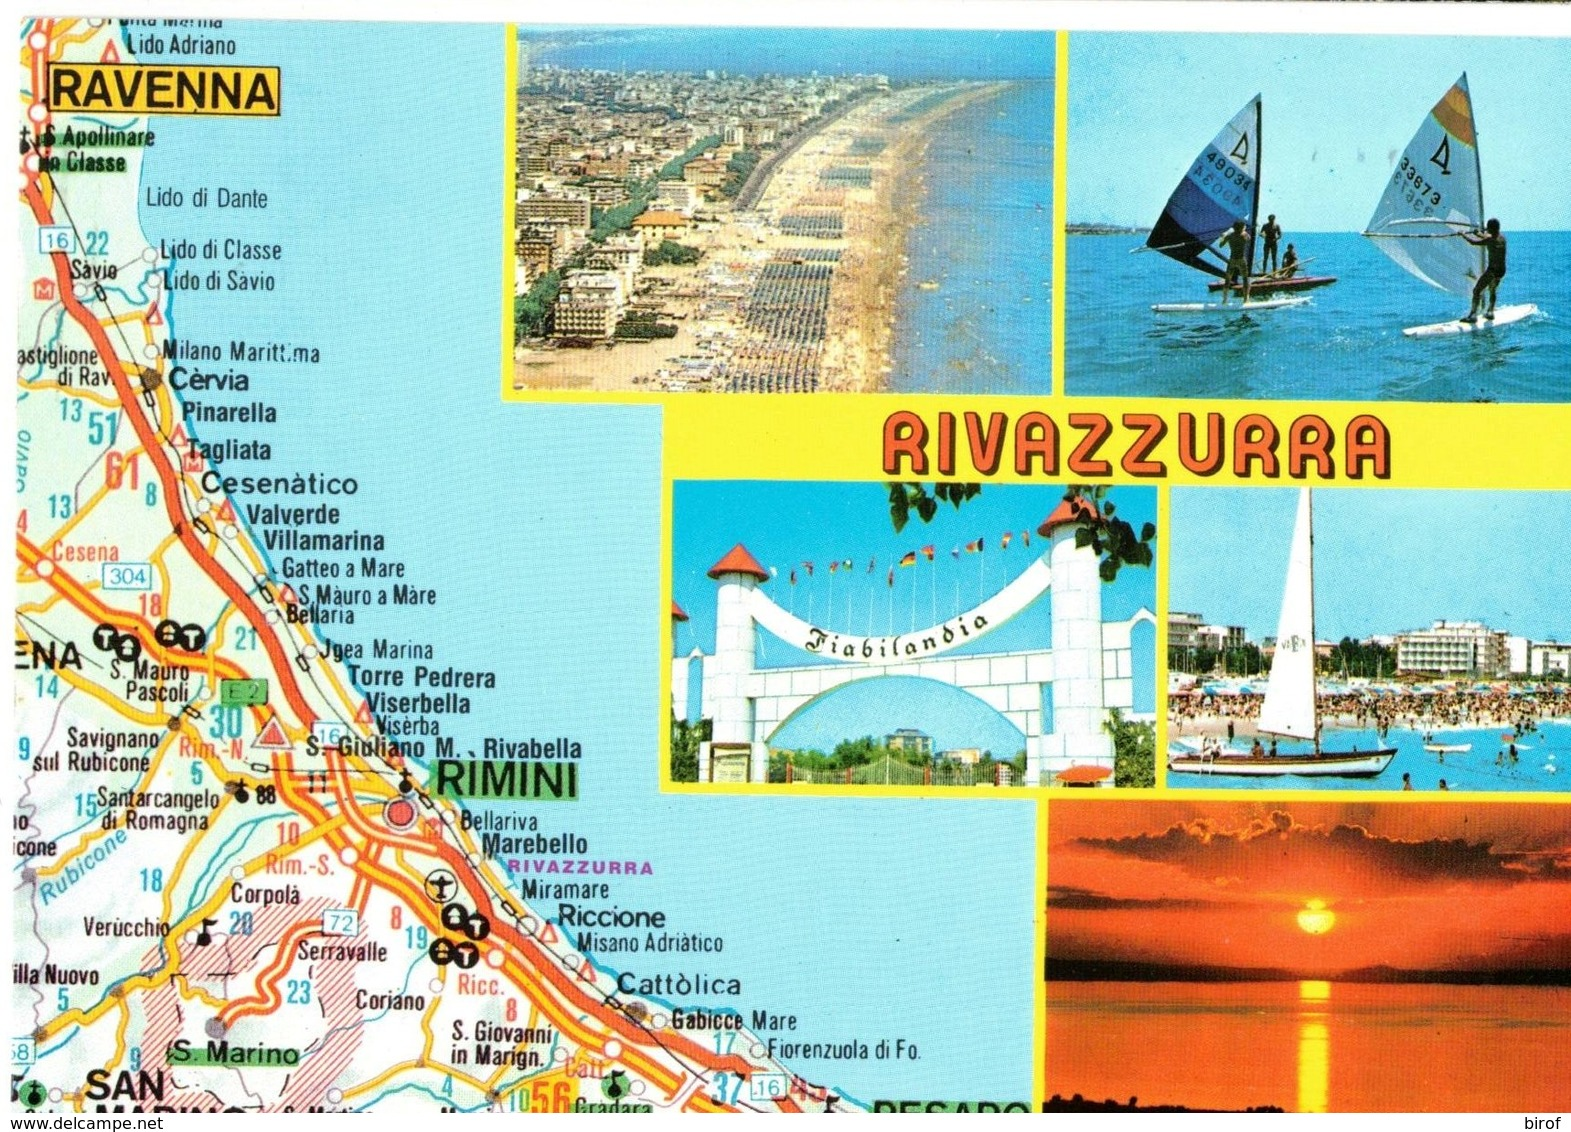 RIVAZZURRA -  - (RN) - Rimini